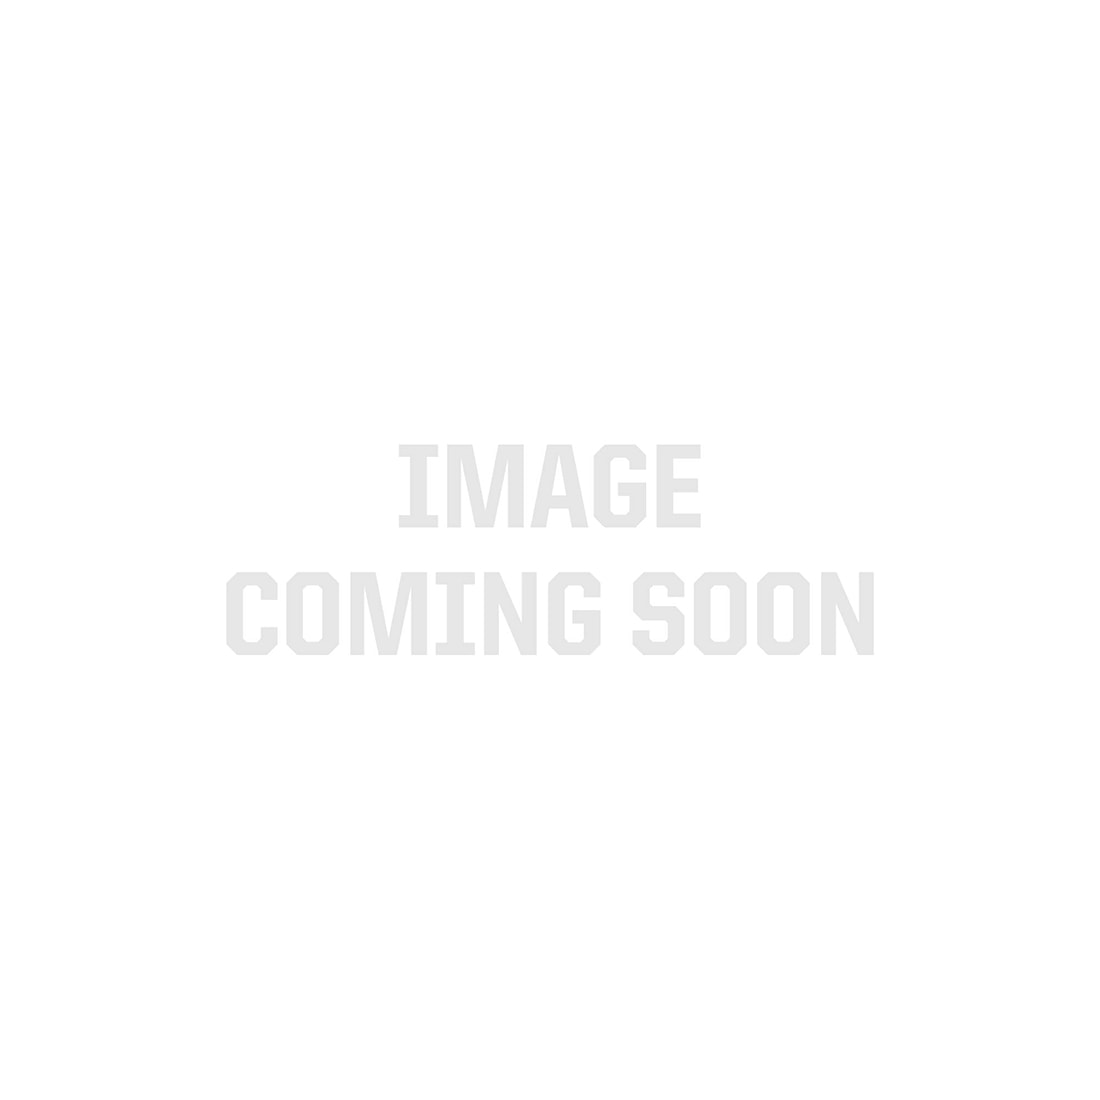 HyperFlex 2835 LED Strip Light - Red - 60/m - CurrentControl - Sample Kit